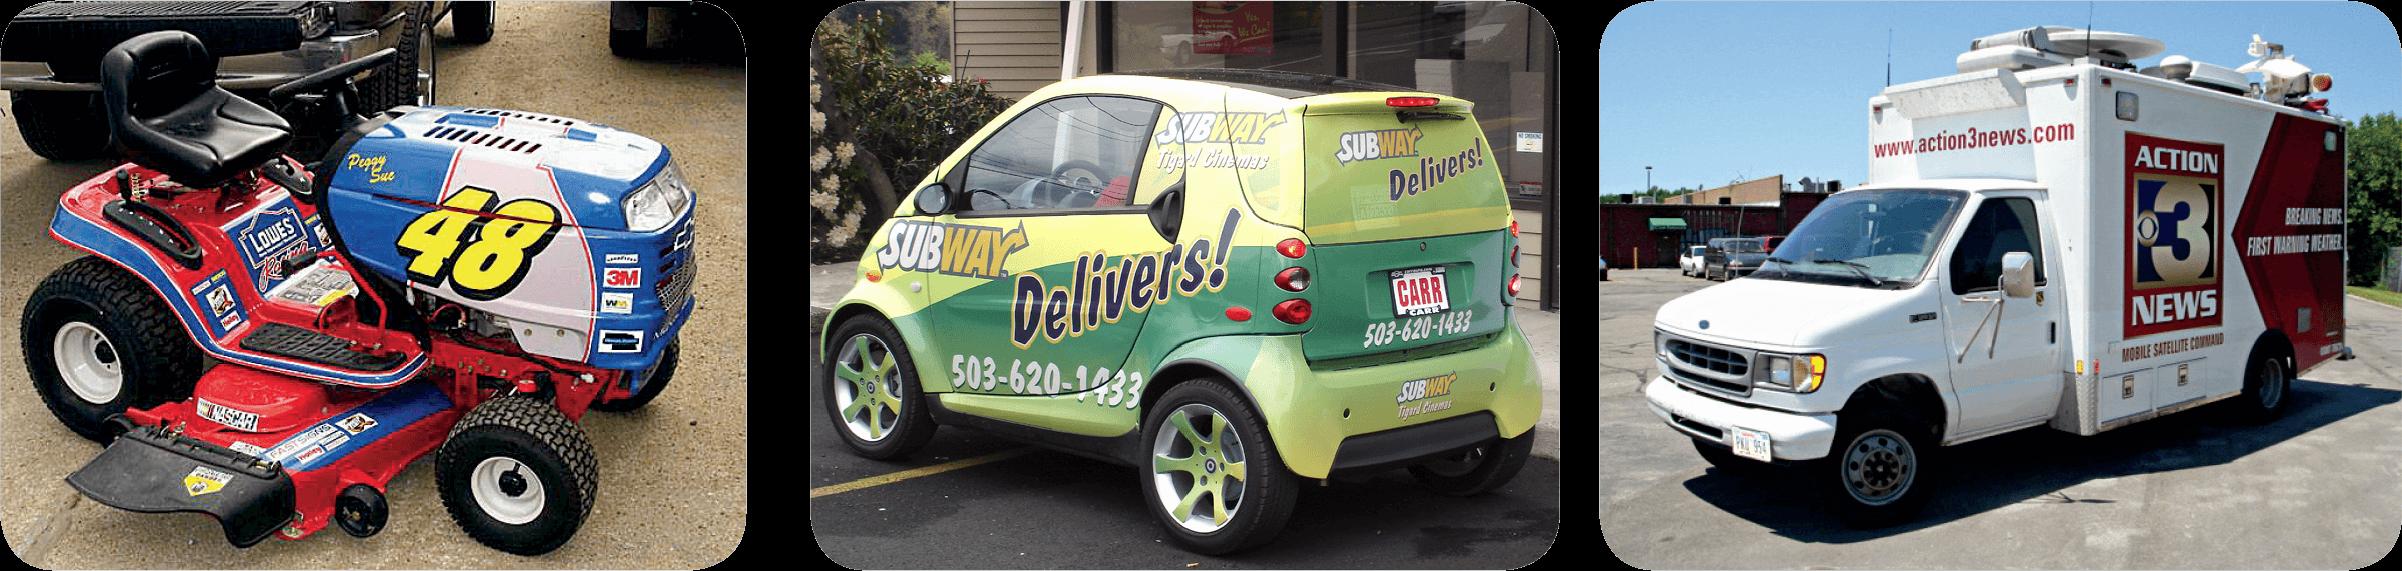 Vehicle Wraps & Truck Lettering